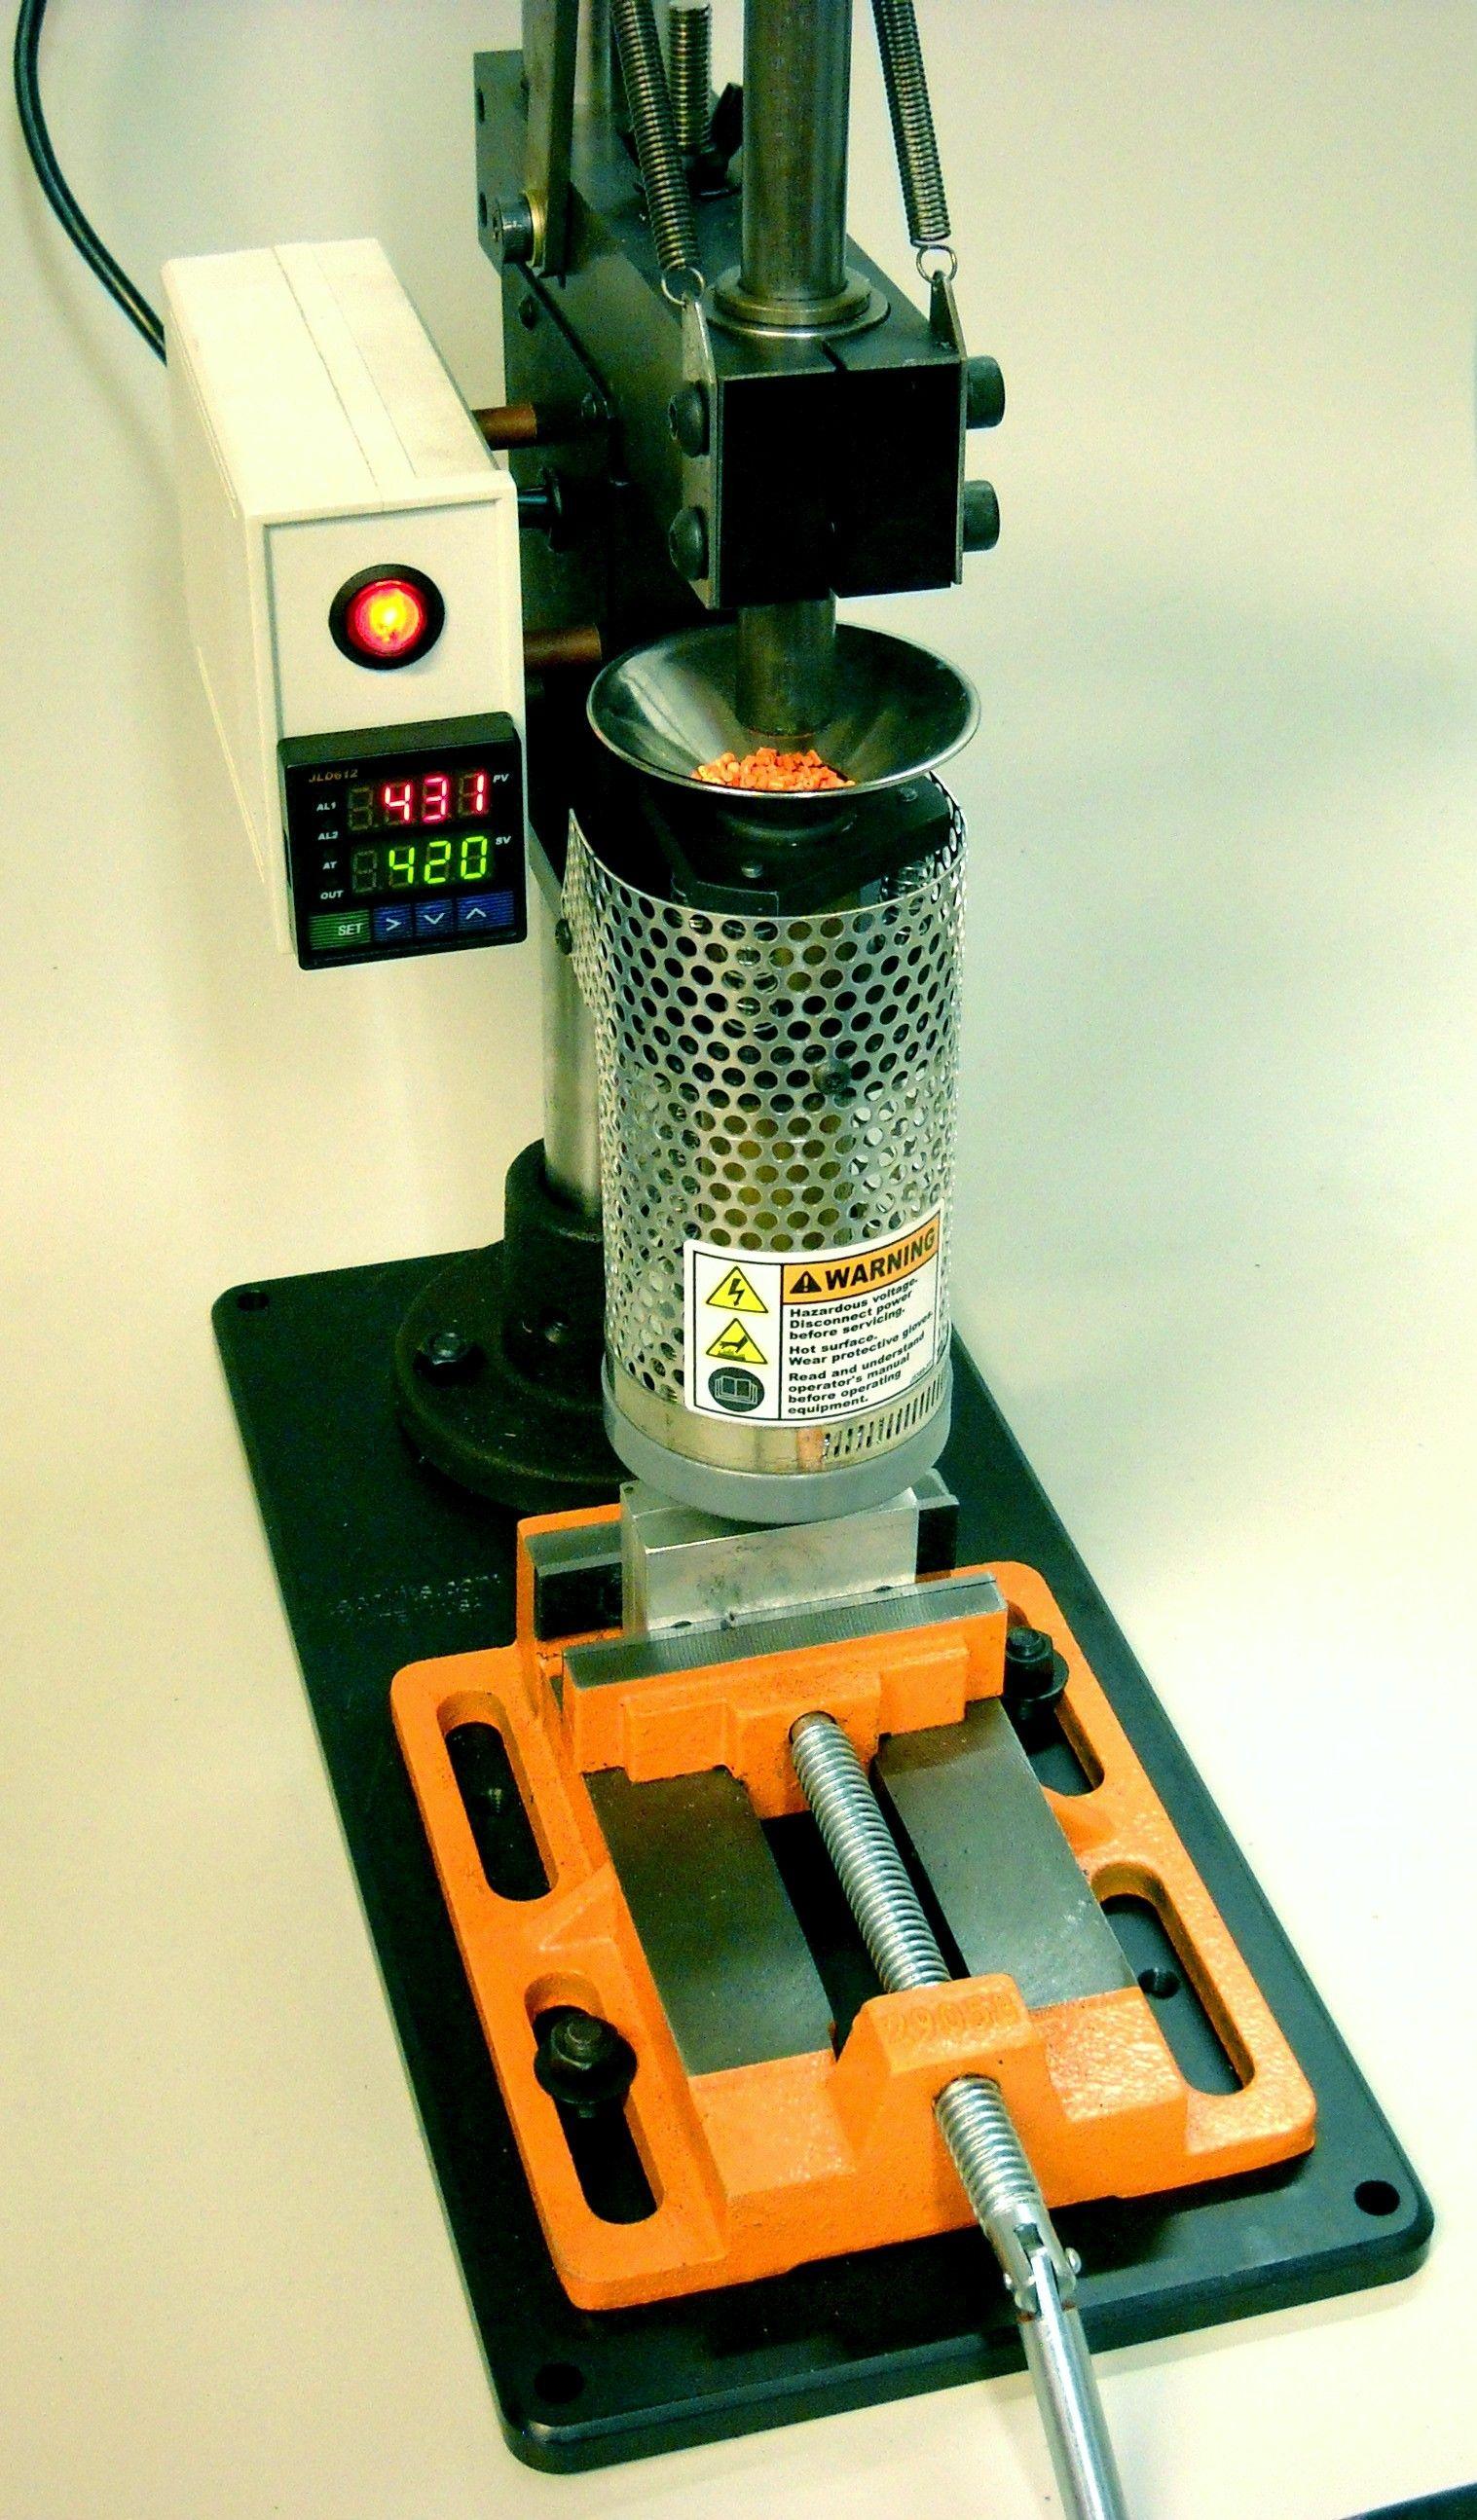 desktop injection molding machine. kickstarter funded. | tool tips